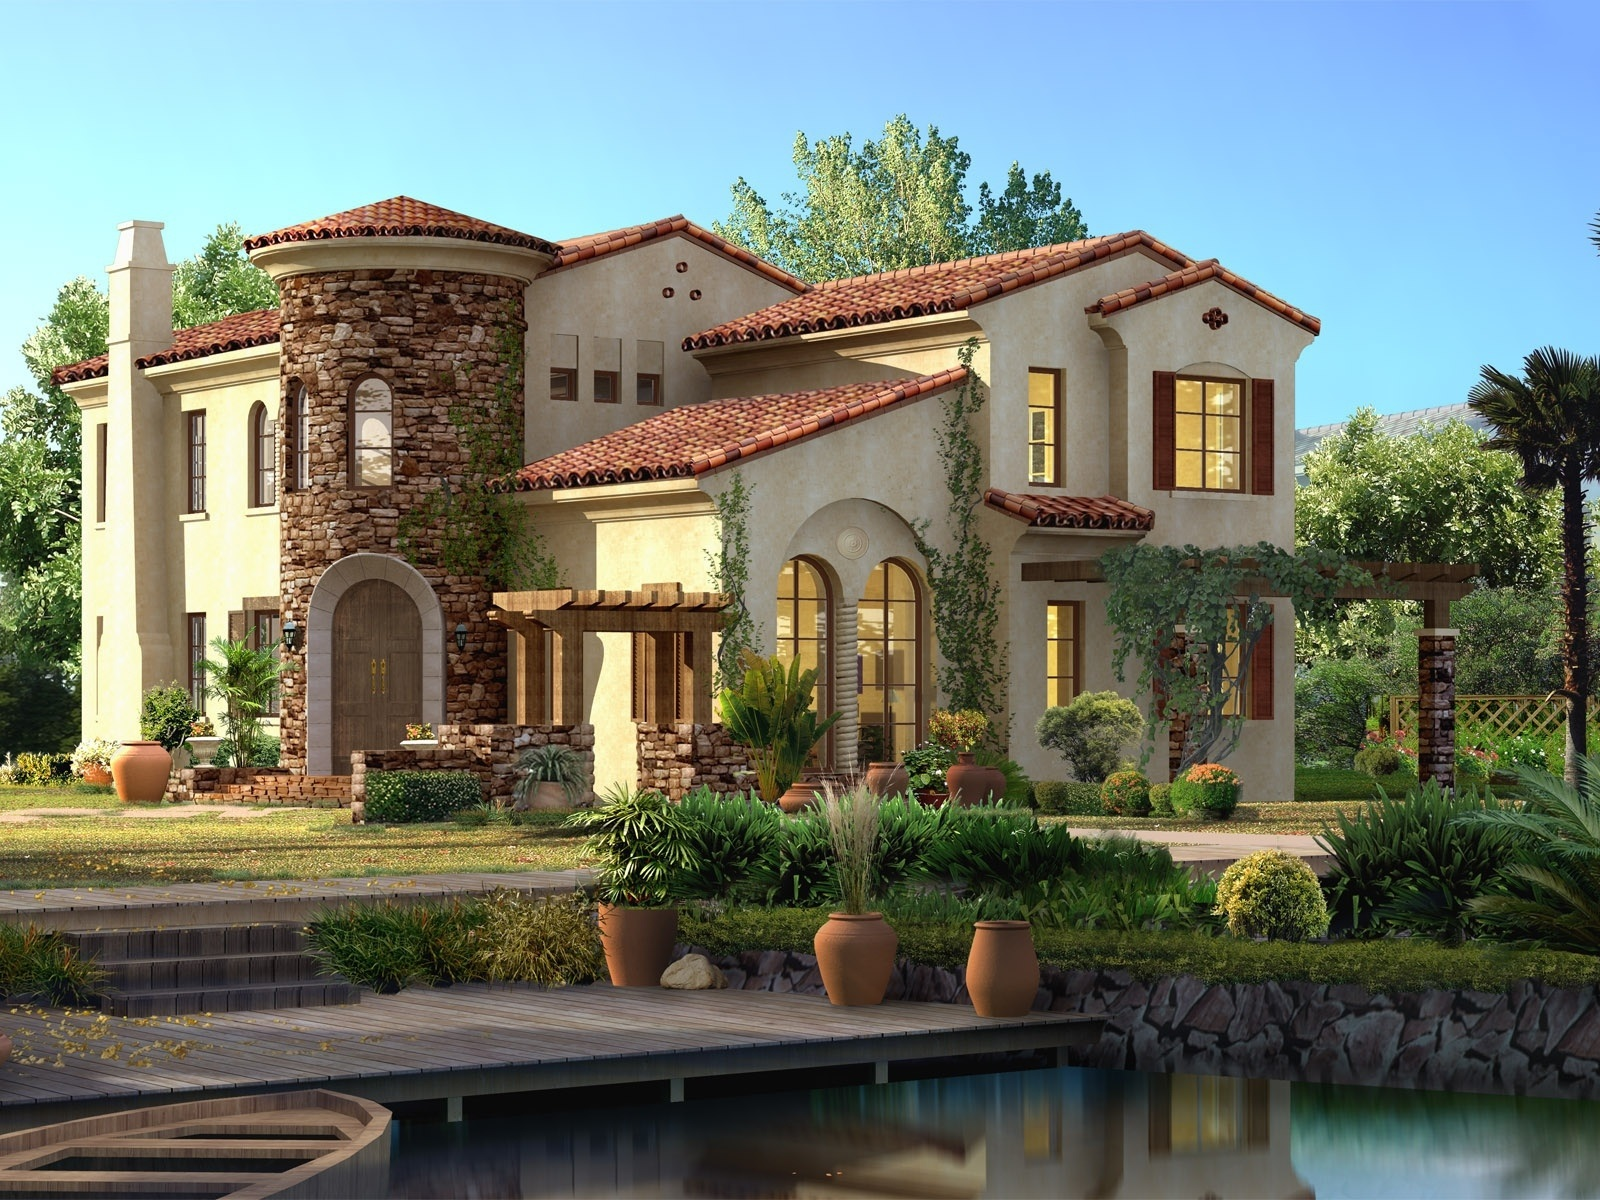 fonds d 39 cran conception 3d maisons arbres villa 1920x1200 hd image. Black Bedroom Furniture Sets. Home Design Ideas